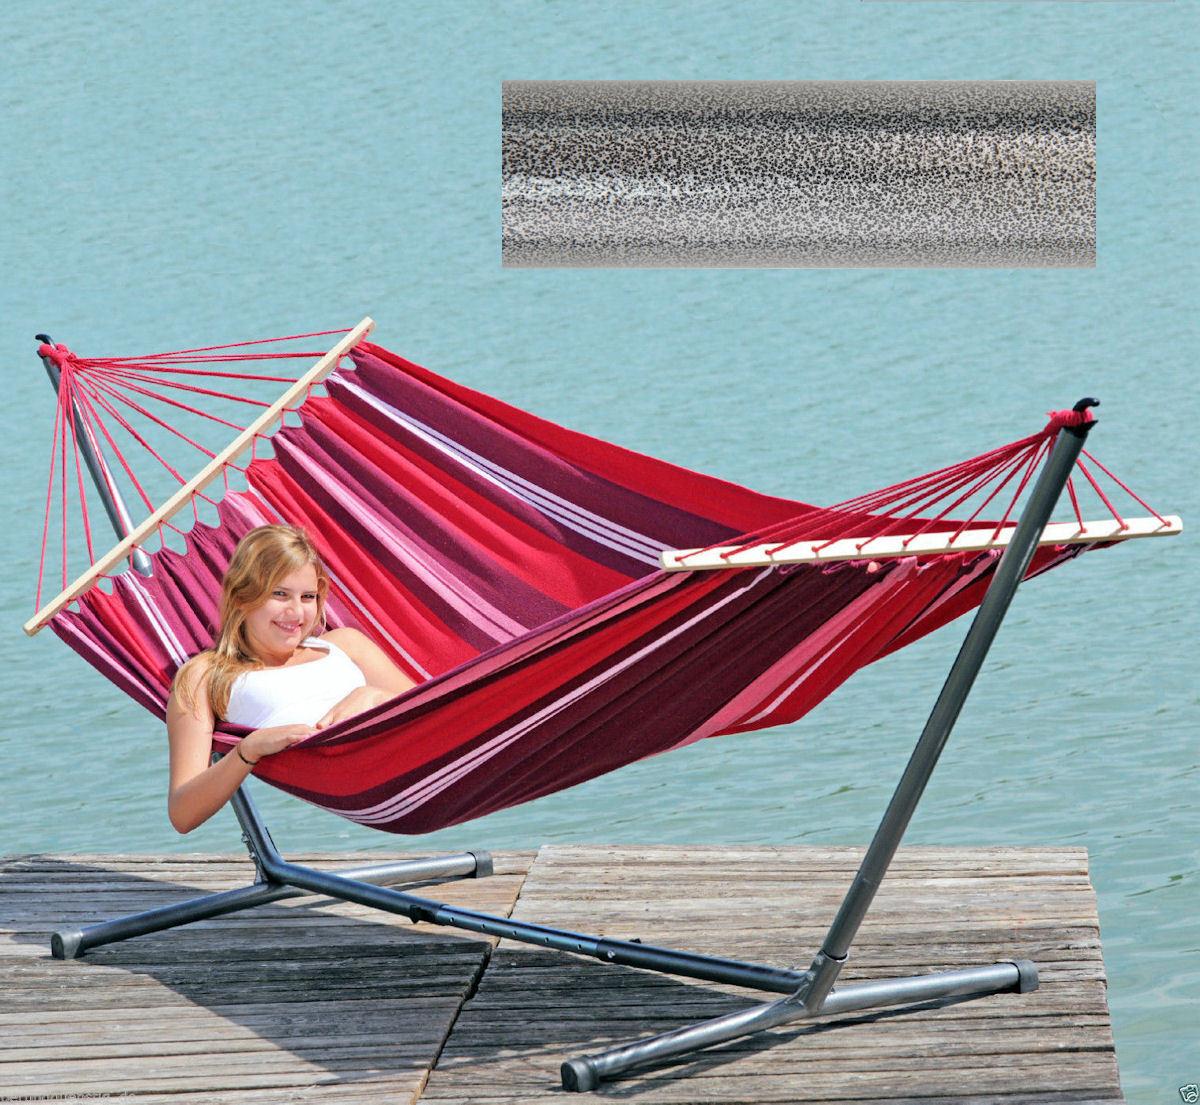 Summer Set - Wetterfeste Amazonas Hängematte Hängematte Hängematte Stabhängematte mit Gestell 4220000 e447c7